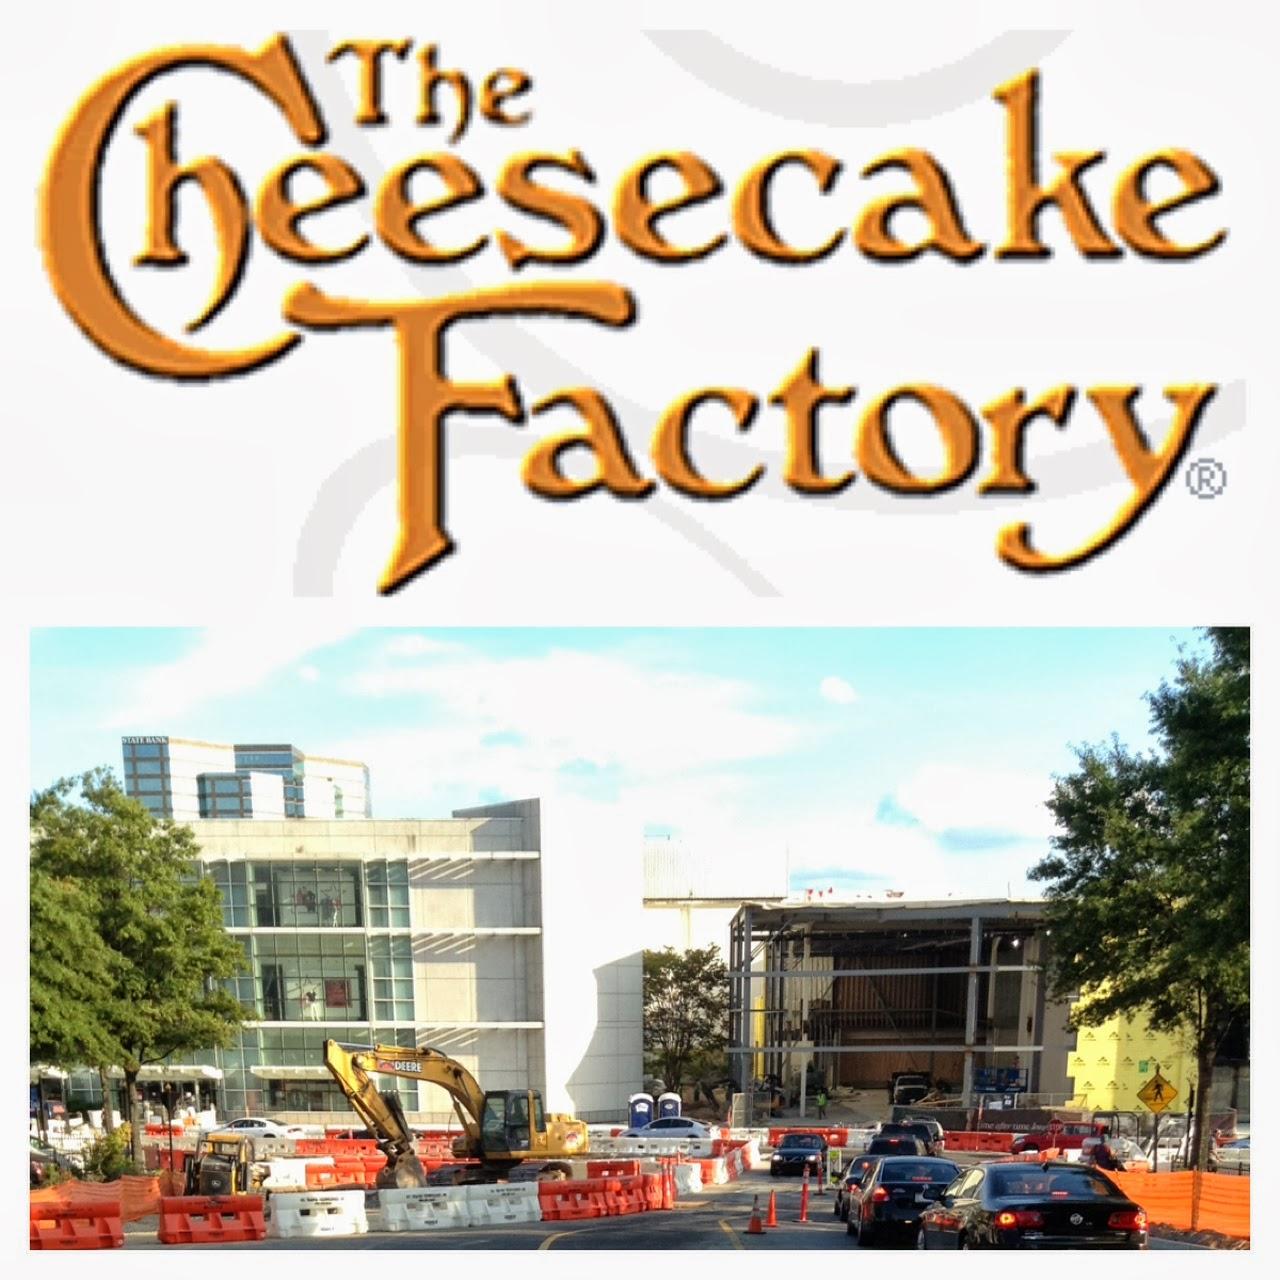 d2cc4734a0 Tomorrow s News Today - Atlanta  The Cheescake Factory is Officially ...